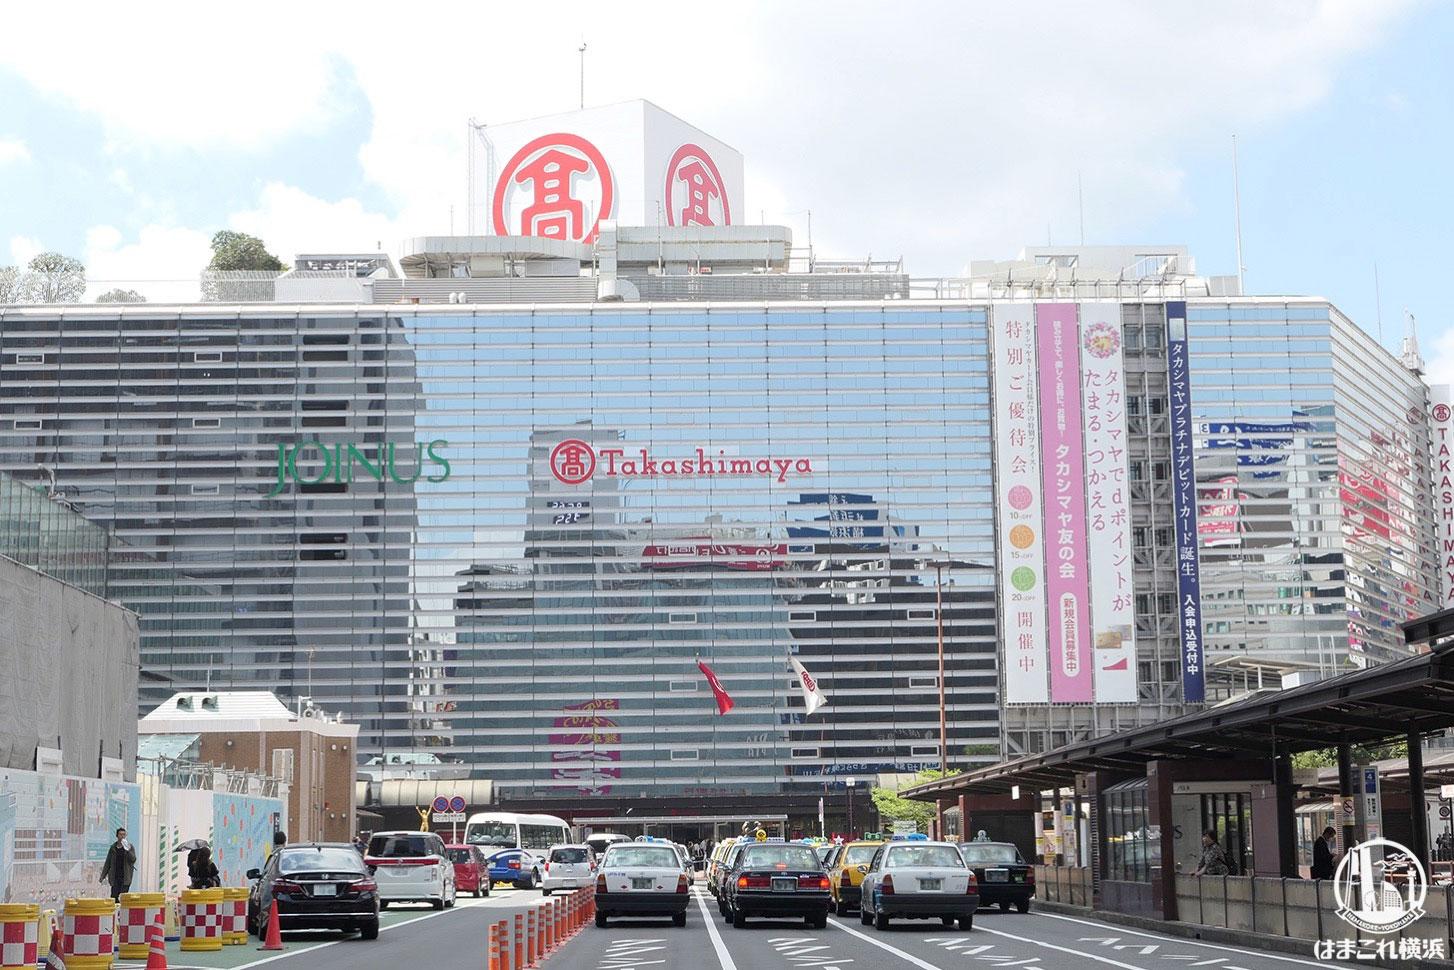 横浜高島屋、5月27日より全館営業再開 緊急事態宣言解除受け